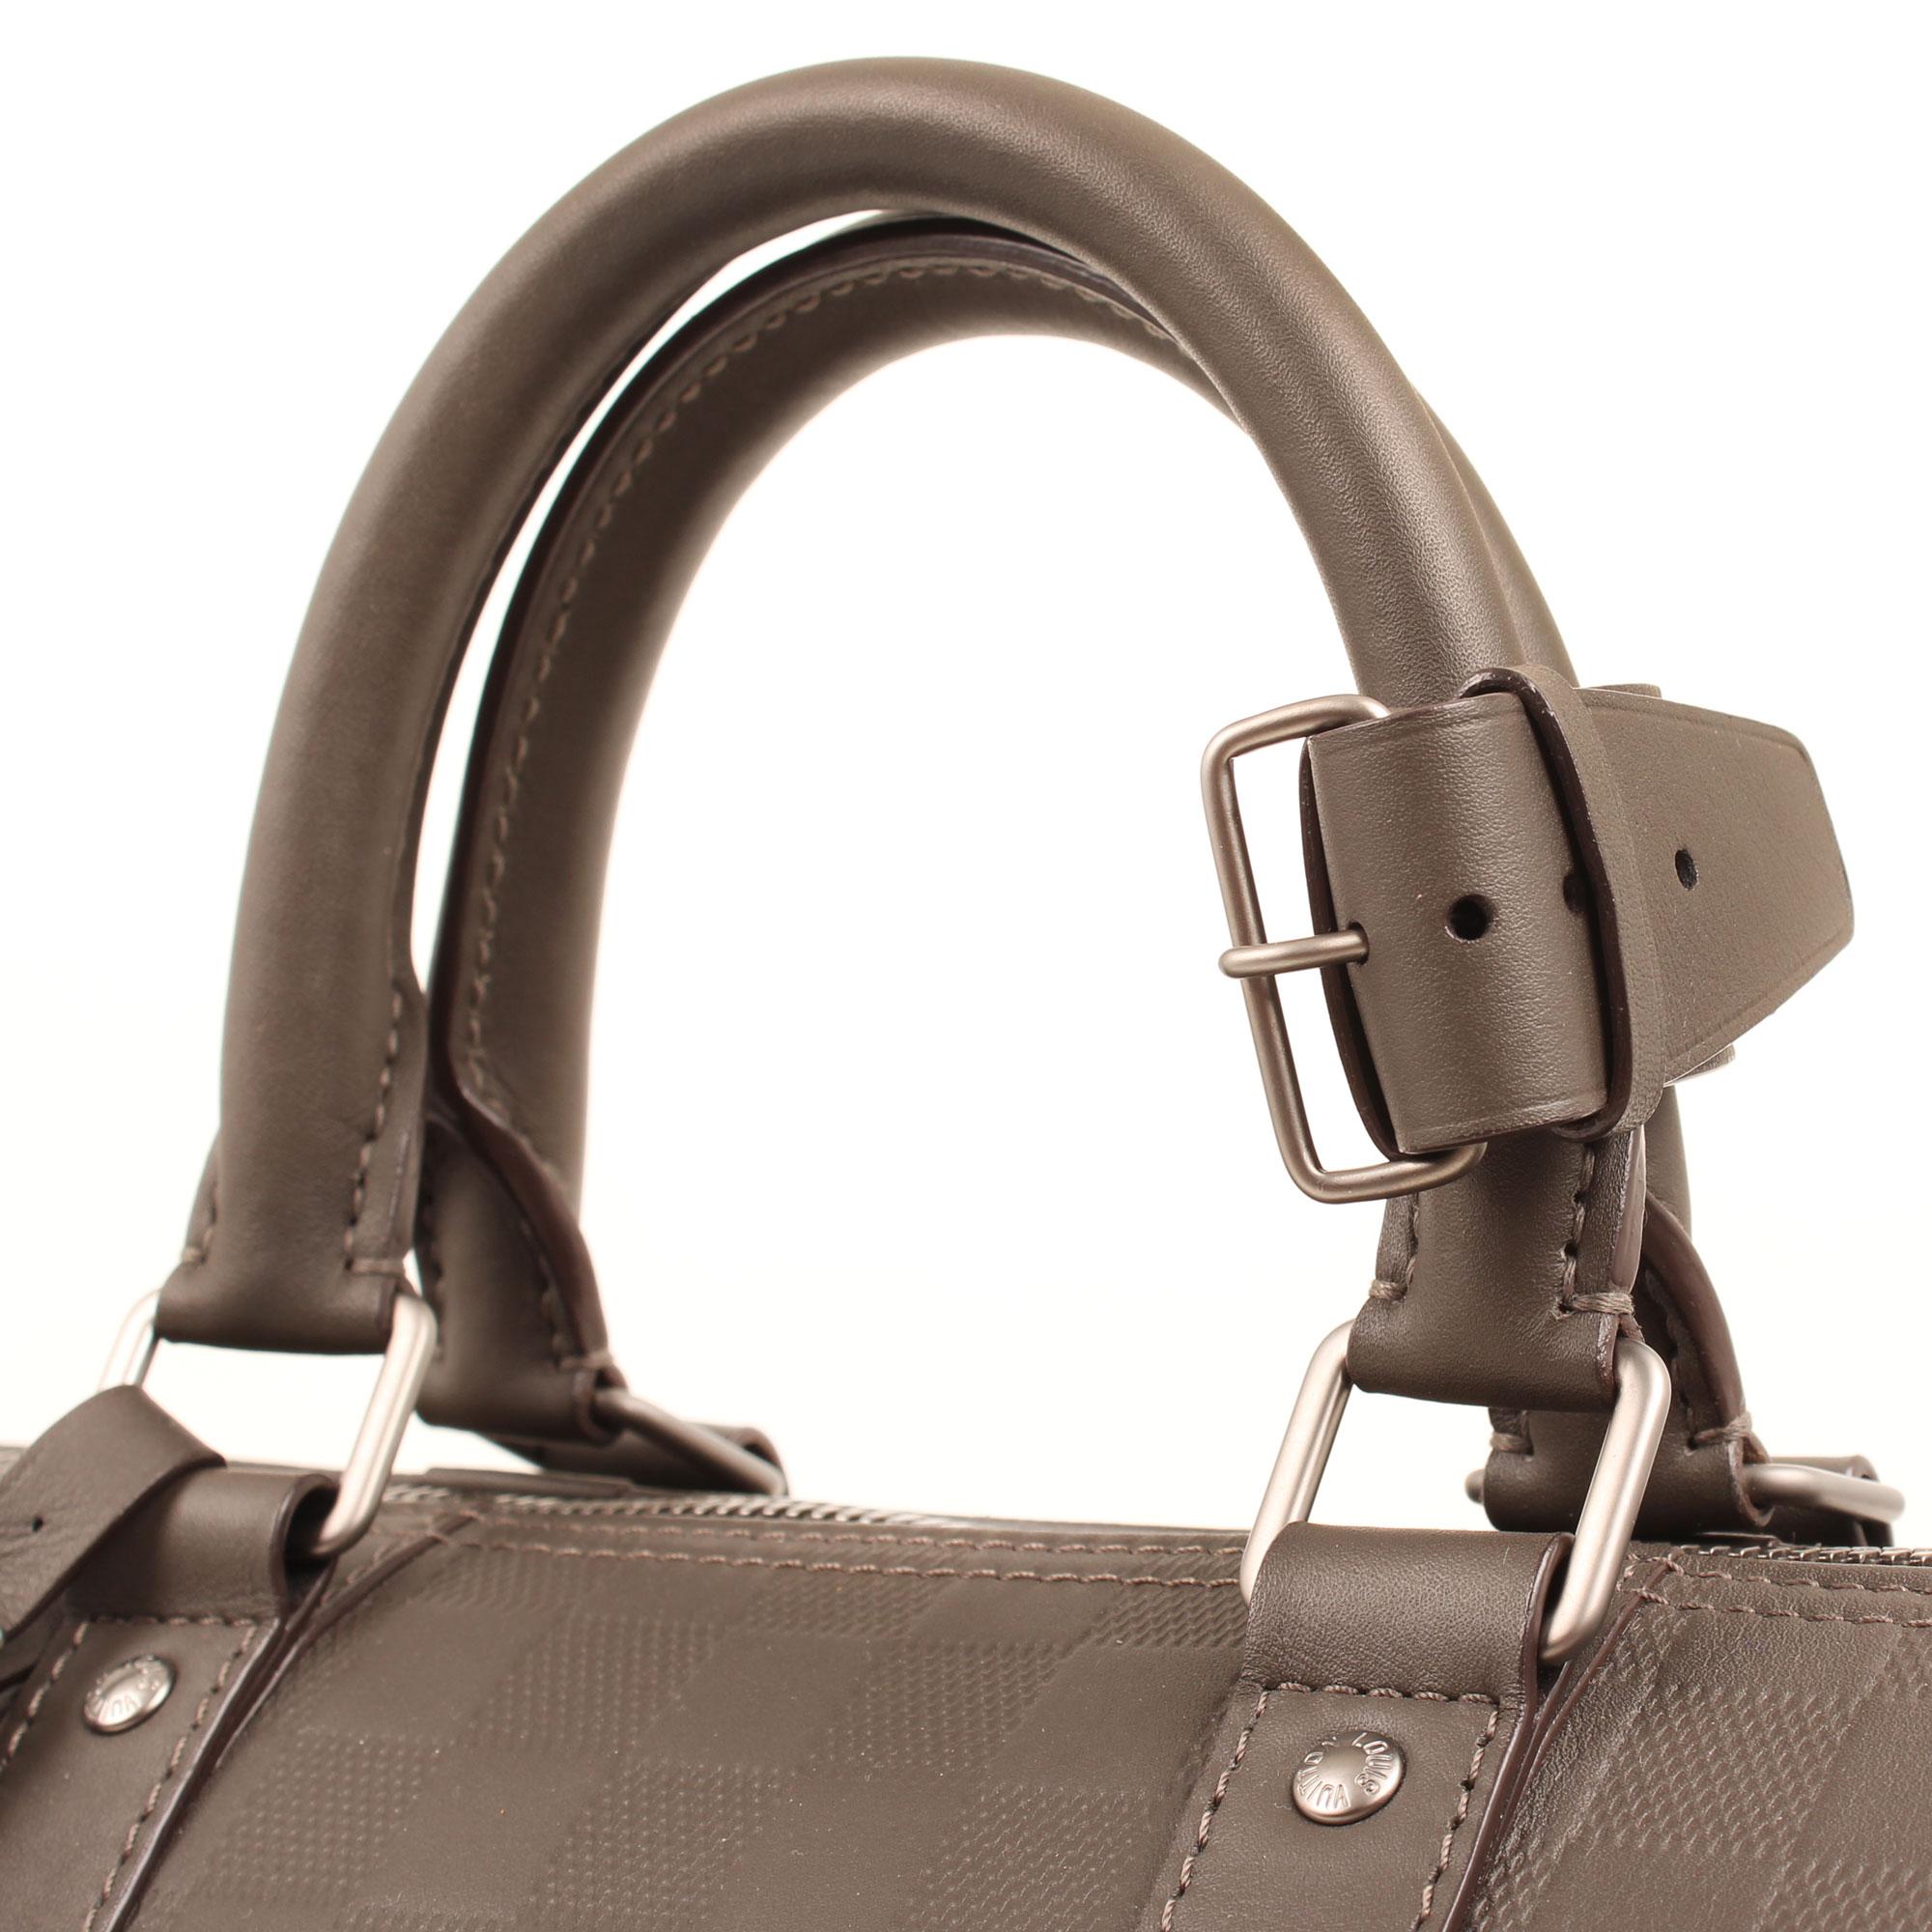 Imagen de las asas de la bolsa louis vuitton keepall 45 damier infini detalle general detalle